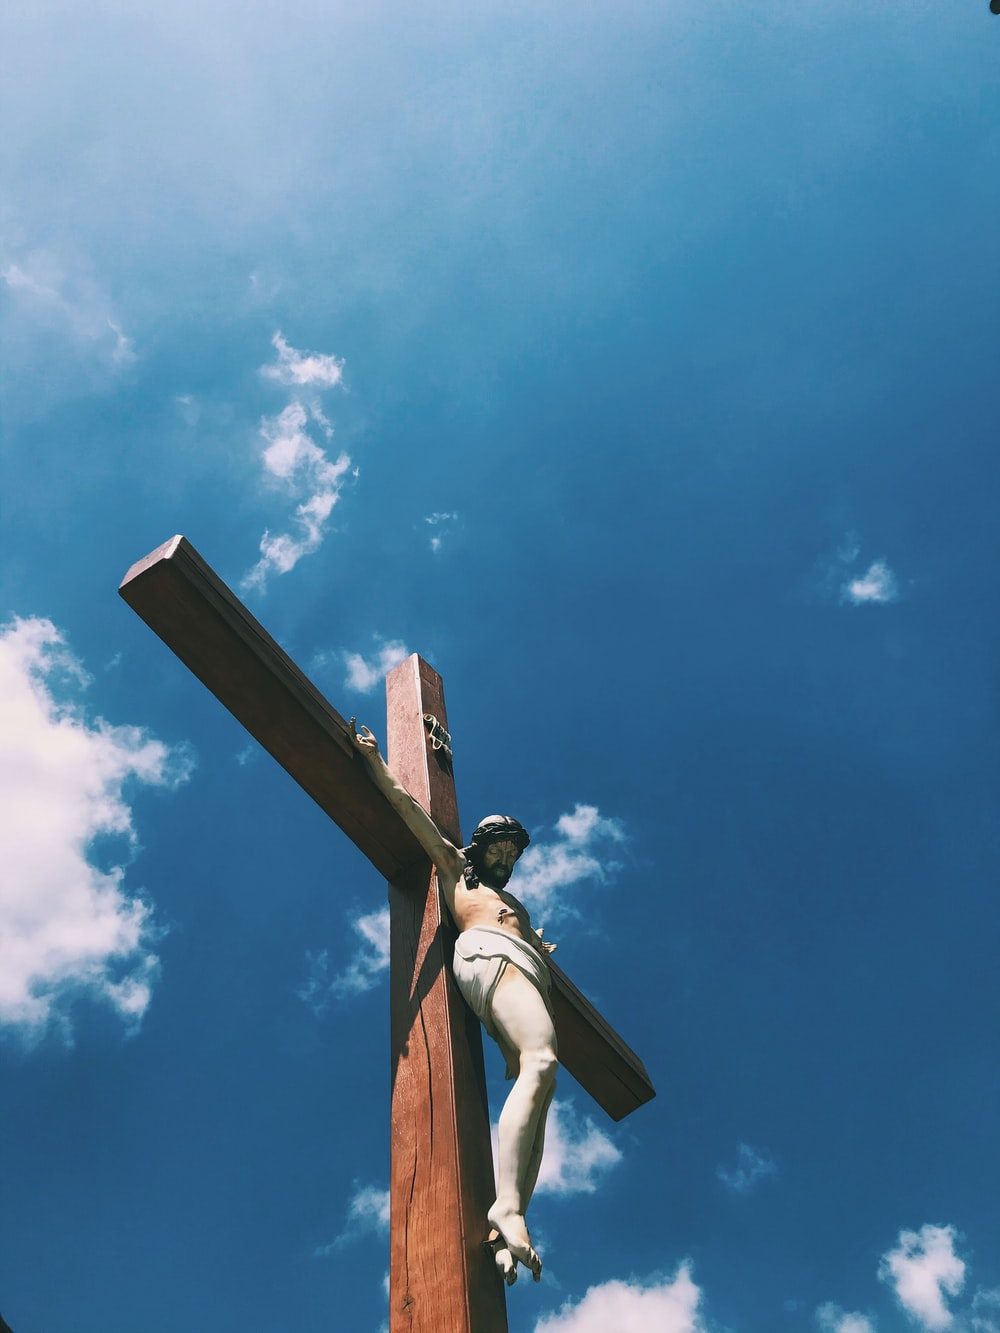 brown wooden cross under blue sky during daytime